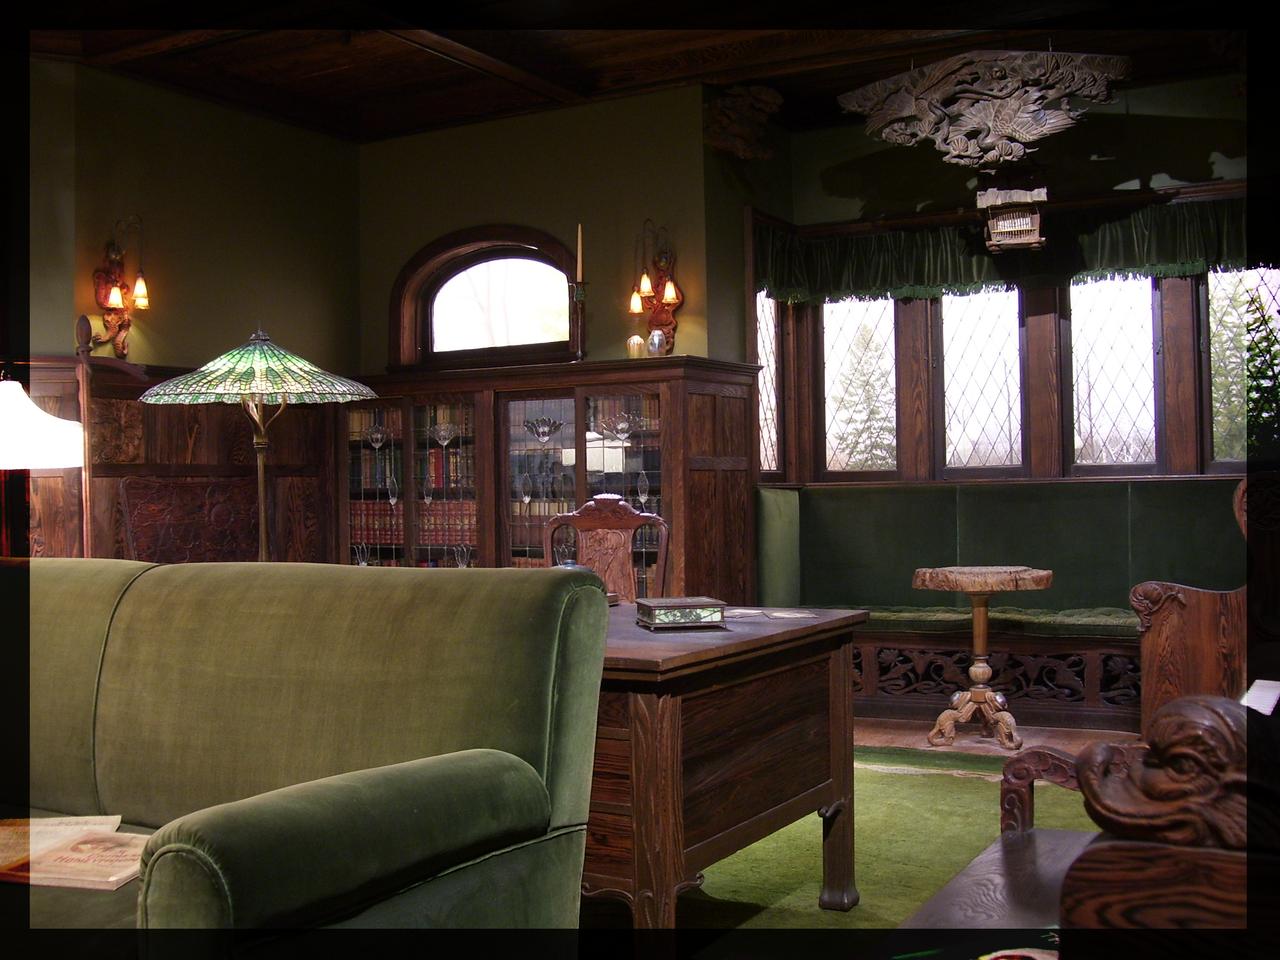 Old minnesota living room by ddrmixer on deviantart for The living room minneapolis mn